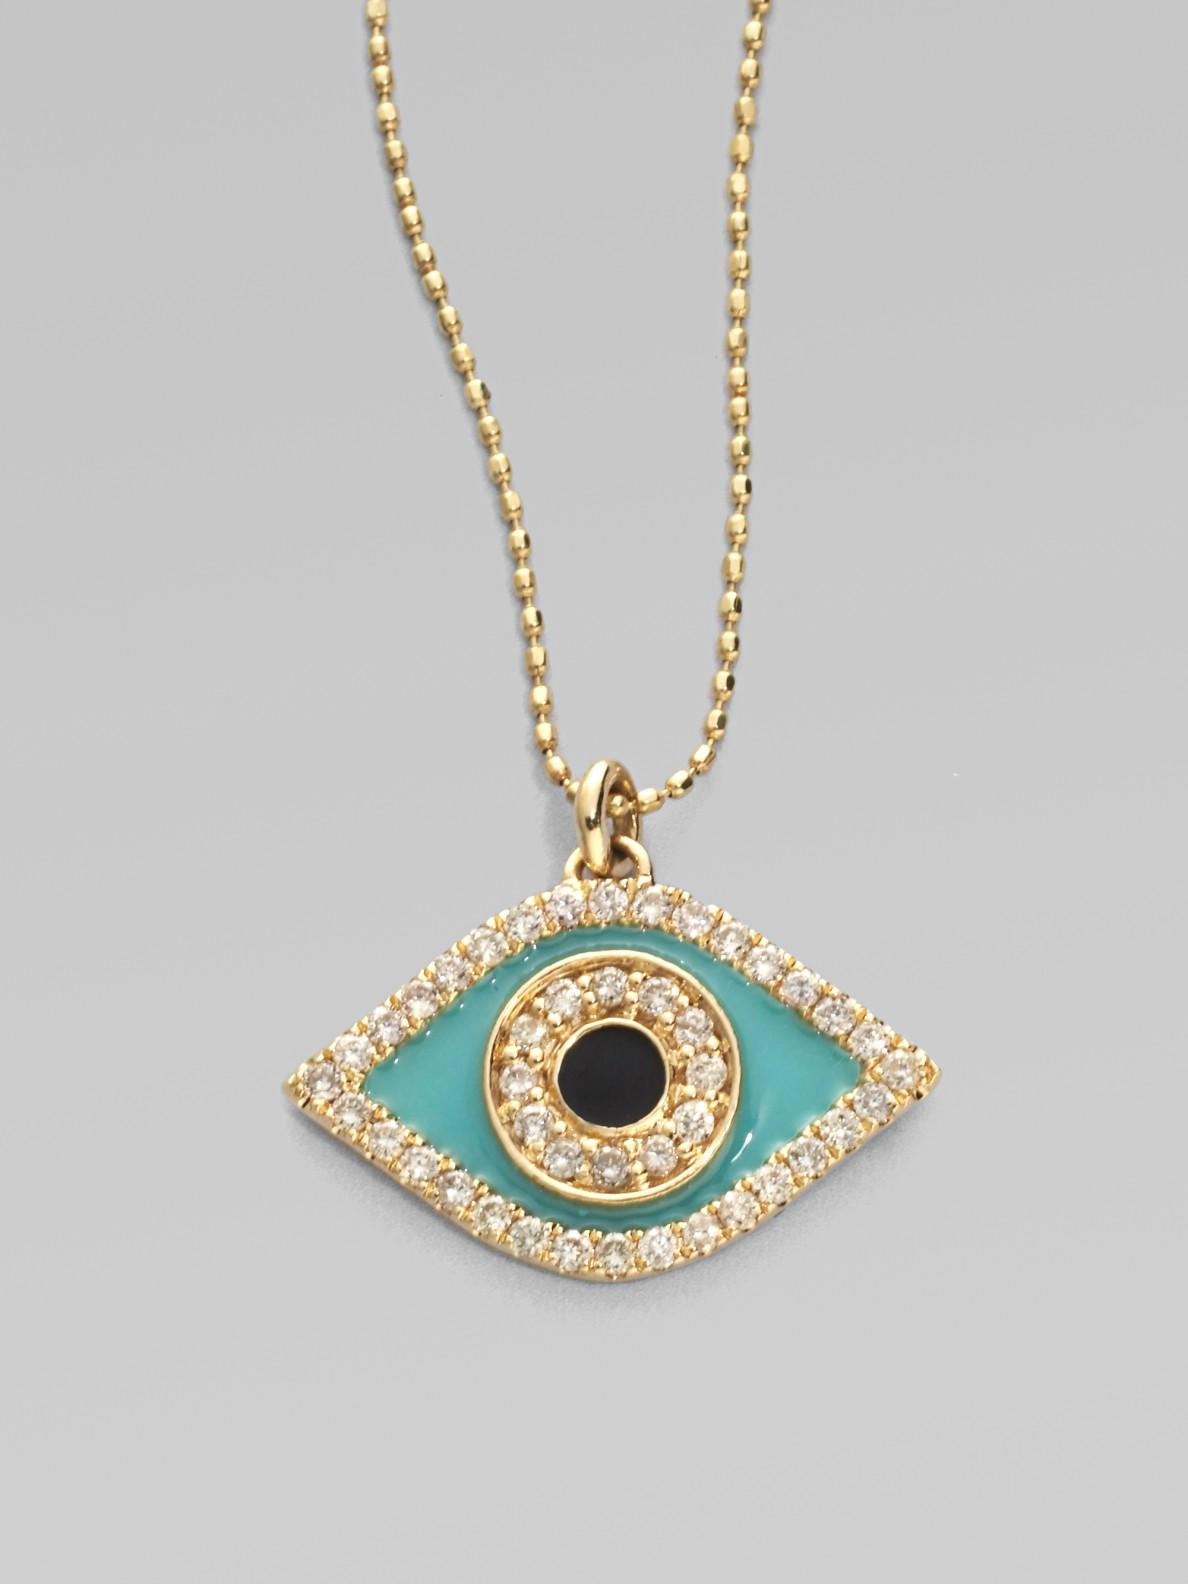 Sydney Evan Small Turquoise Cabochon Evil Eye Pendant Necklace w/Diamonds kyfF7